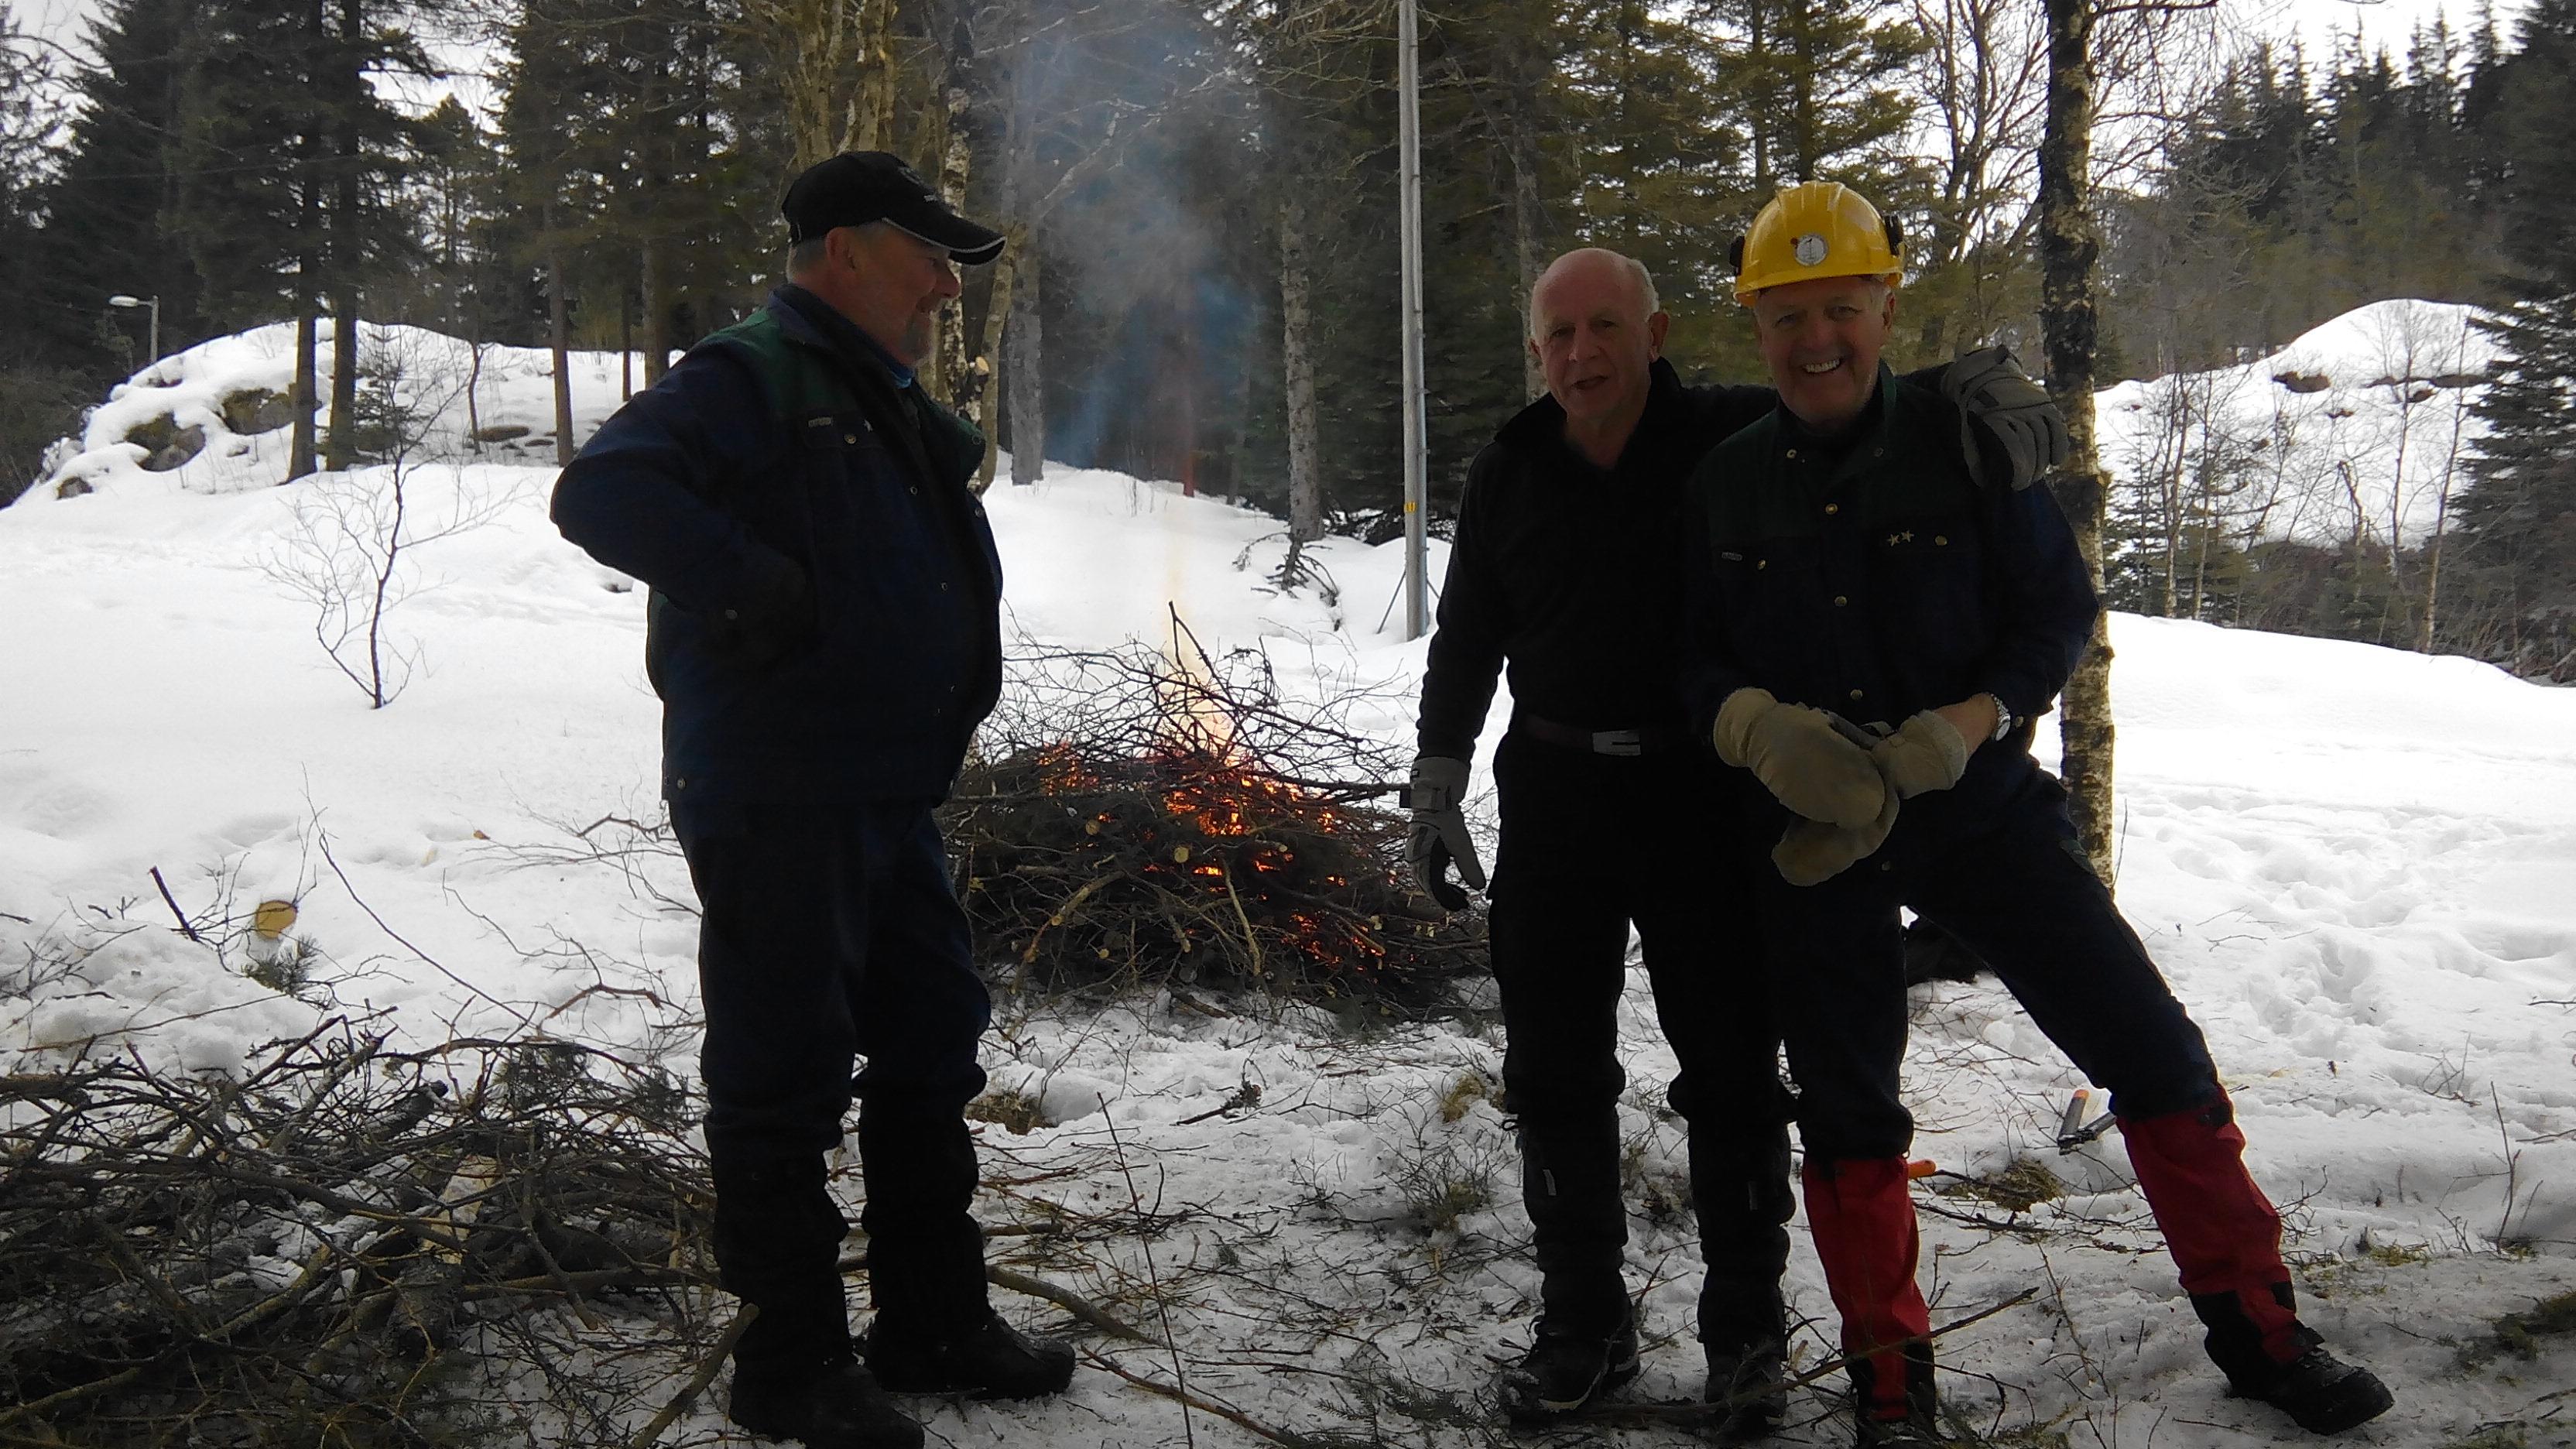 101  Tre karer som holder varmen ved bålet.